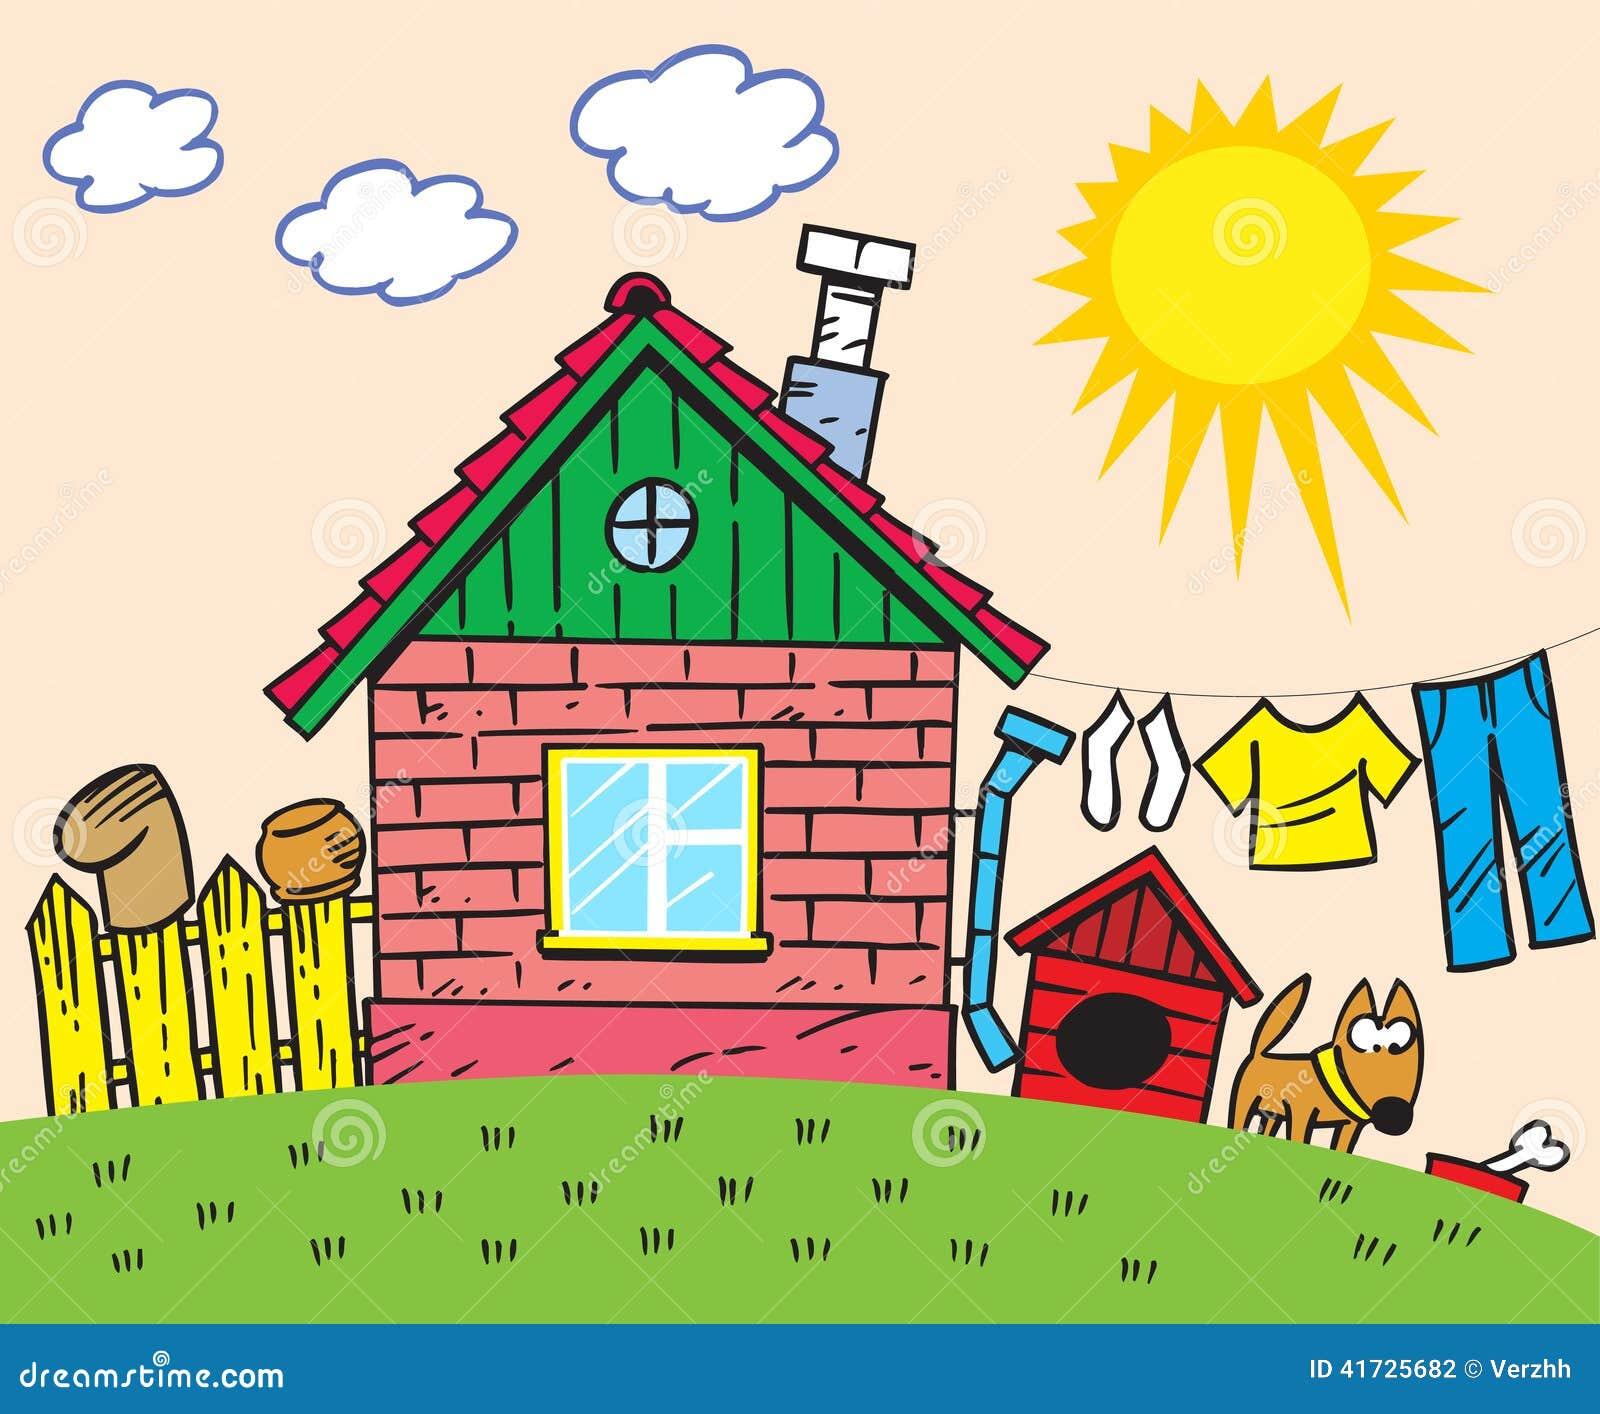 House design cartoon - Royalty Free Vector Download Cartoon House